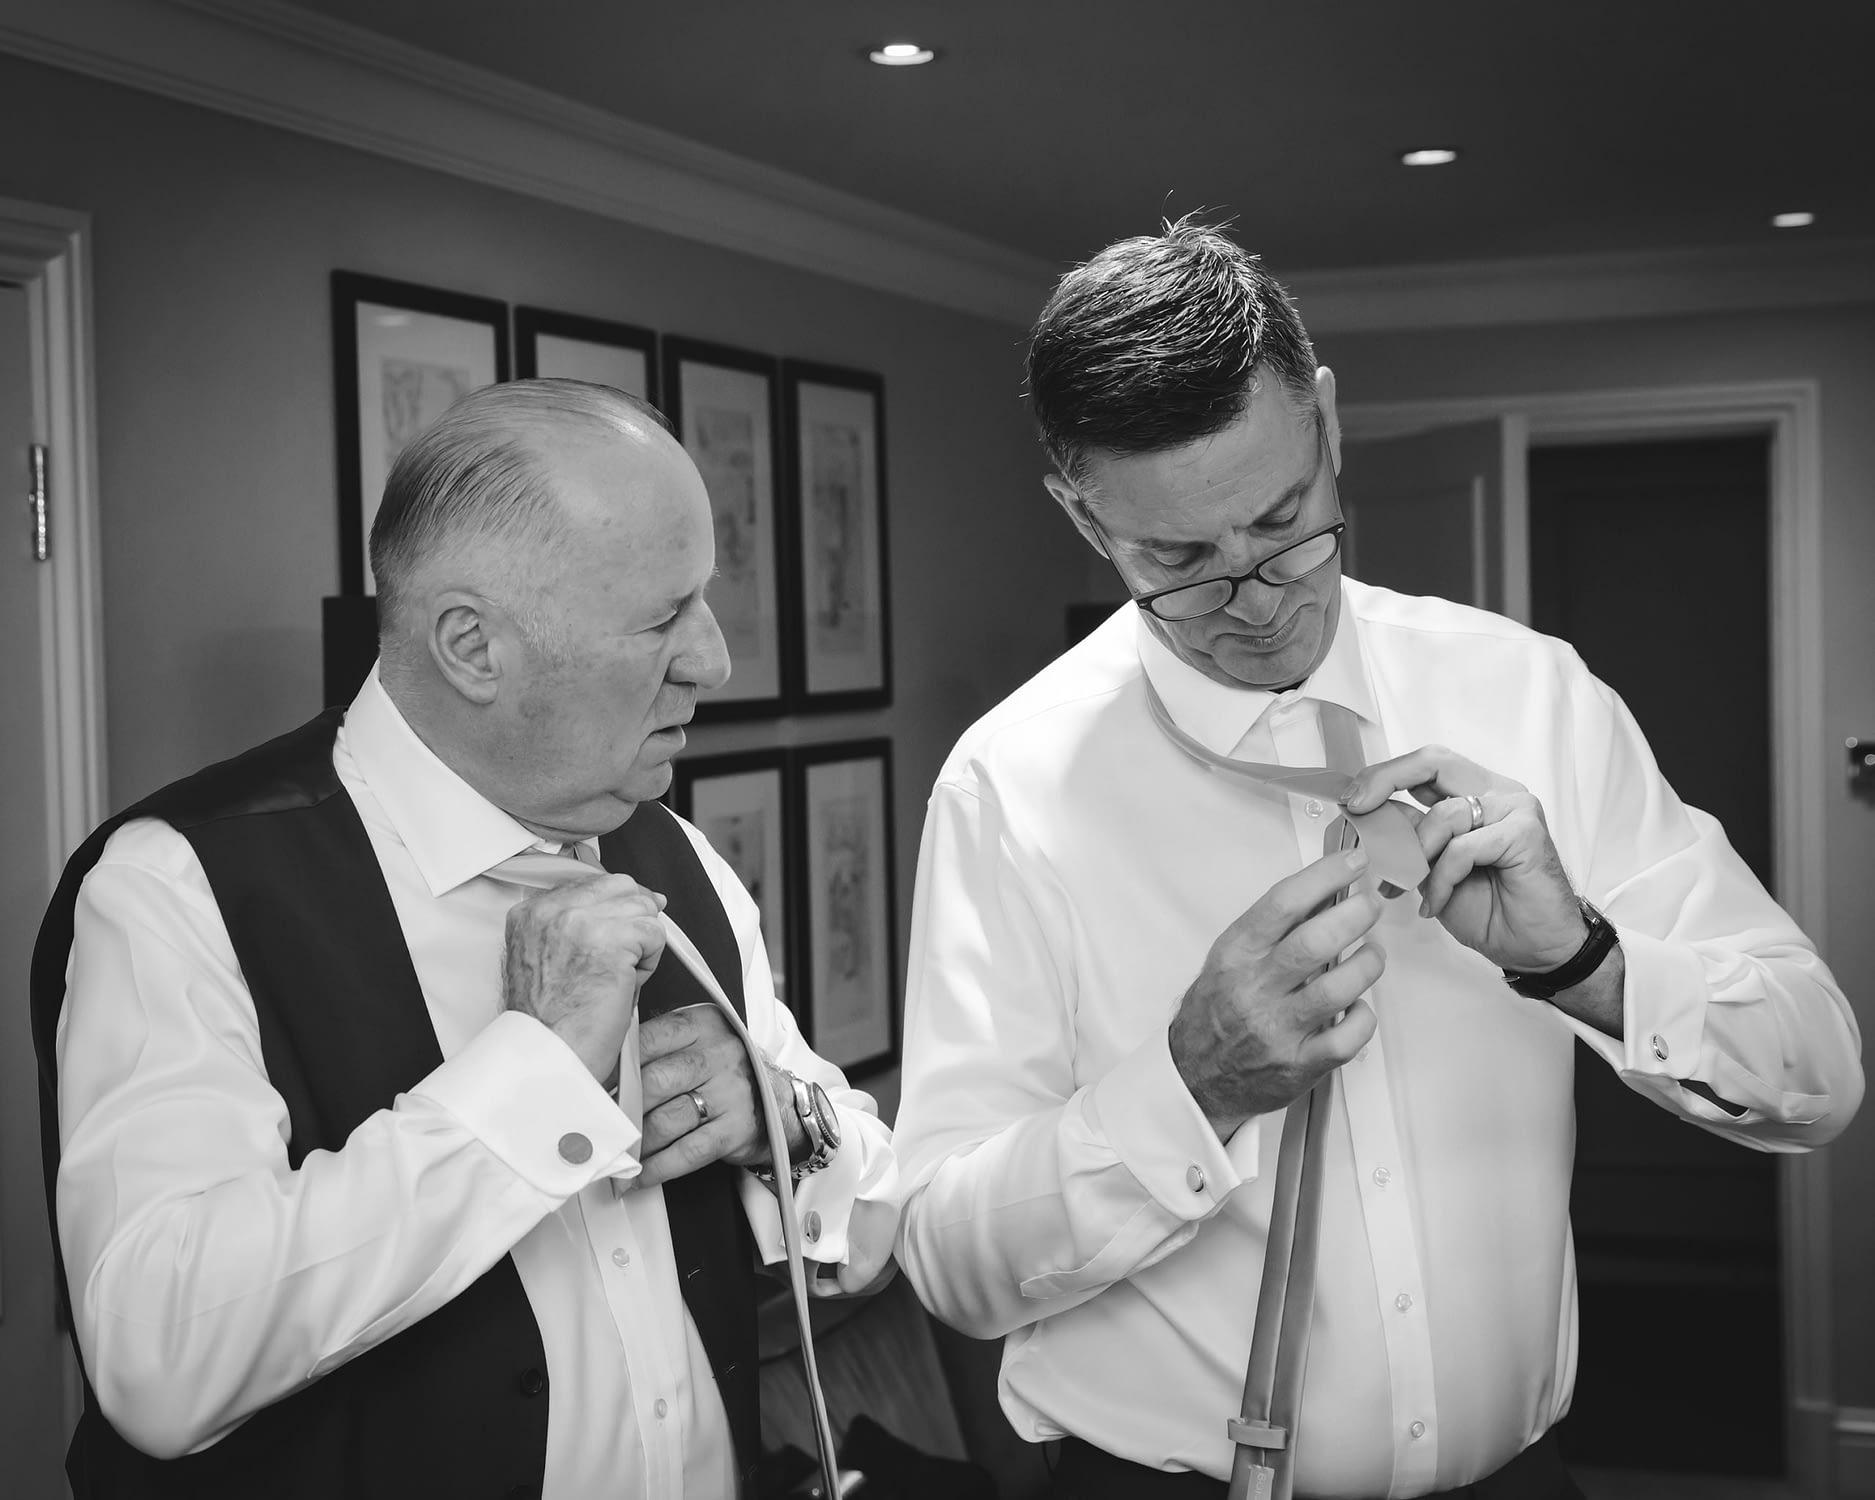 two men tying ties